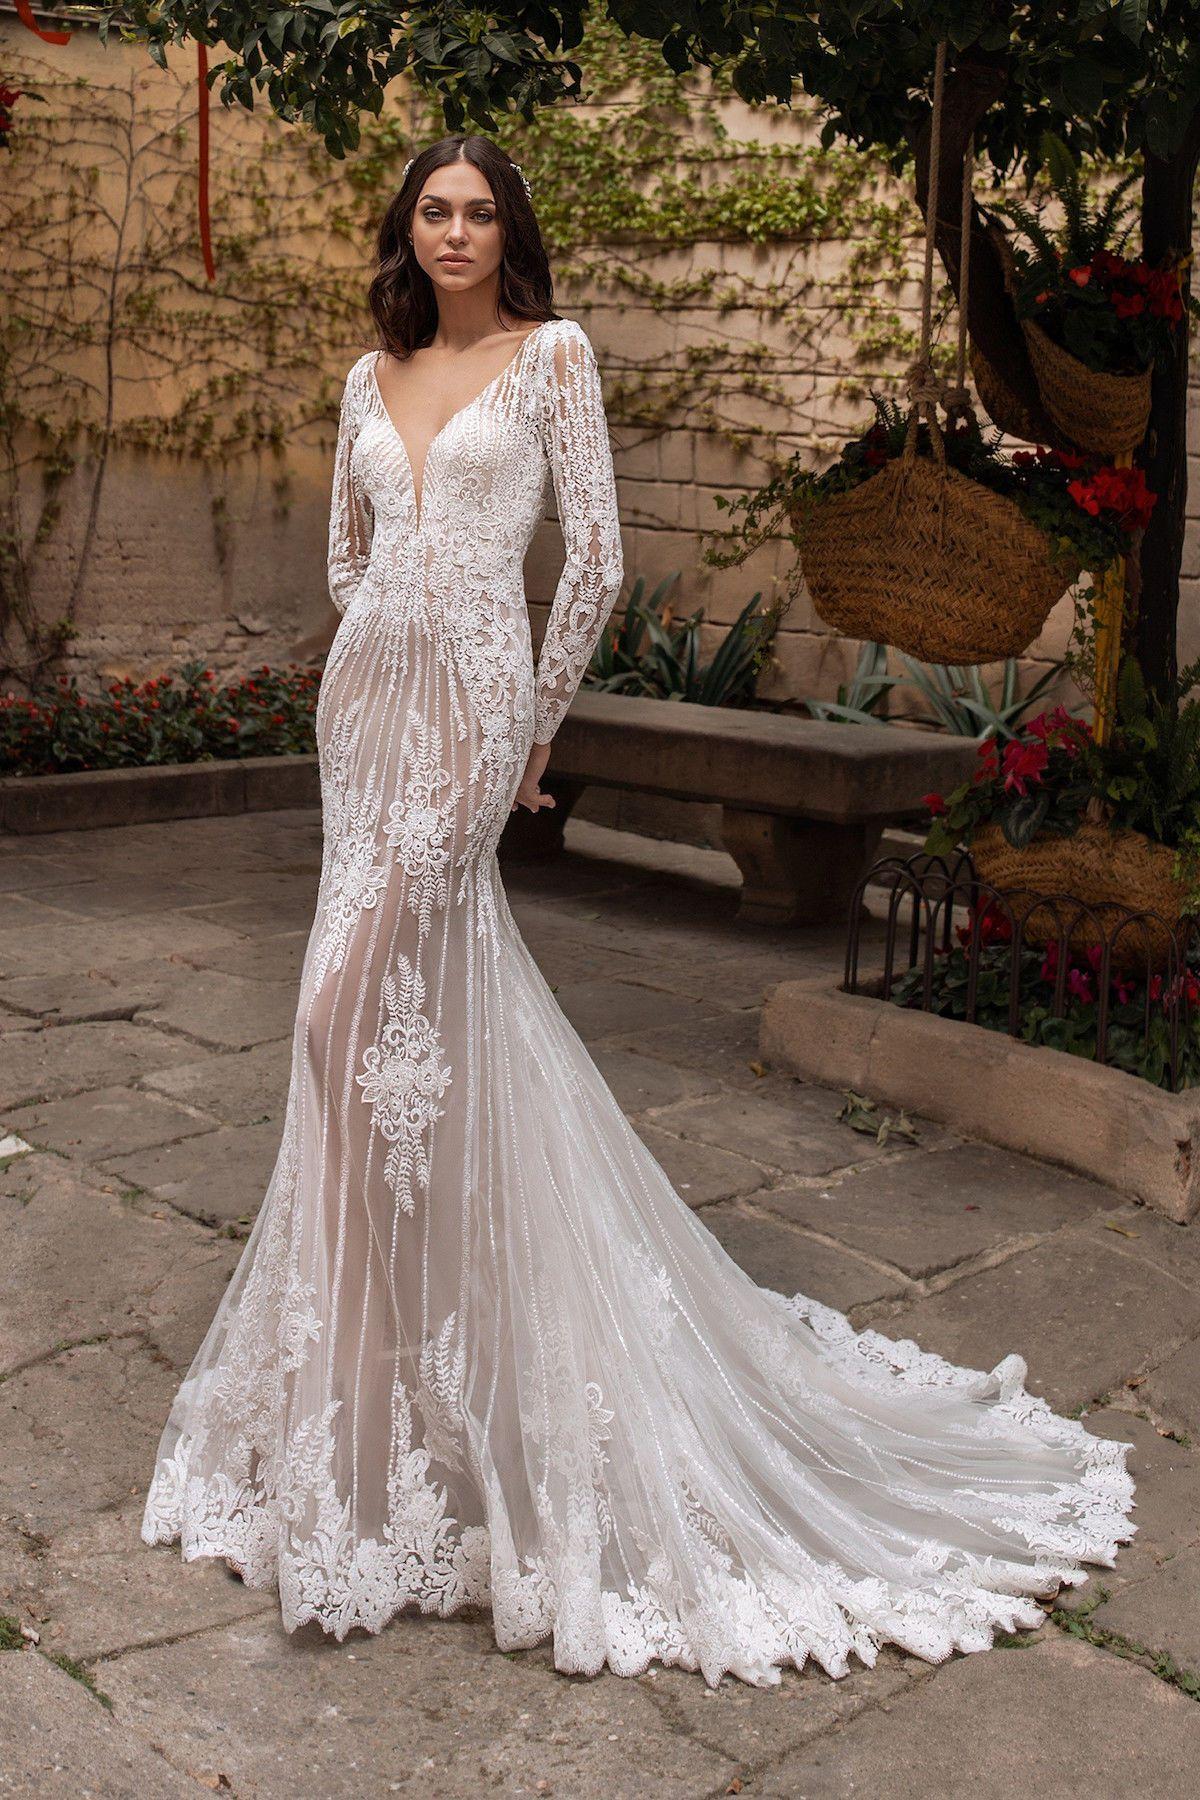 Pronovias Mermaid Wedding Dress Guides For Brides In 2020 Lace Weddings Wedding Dresses Simple Bridal Dresses [ 1800 x 1200 Pixel ]